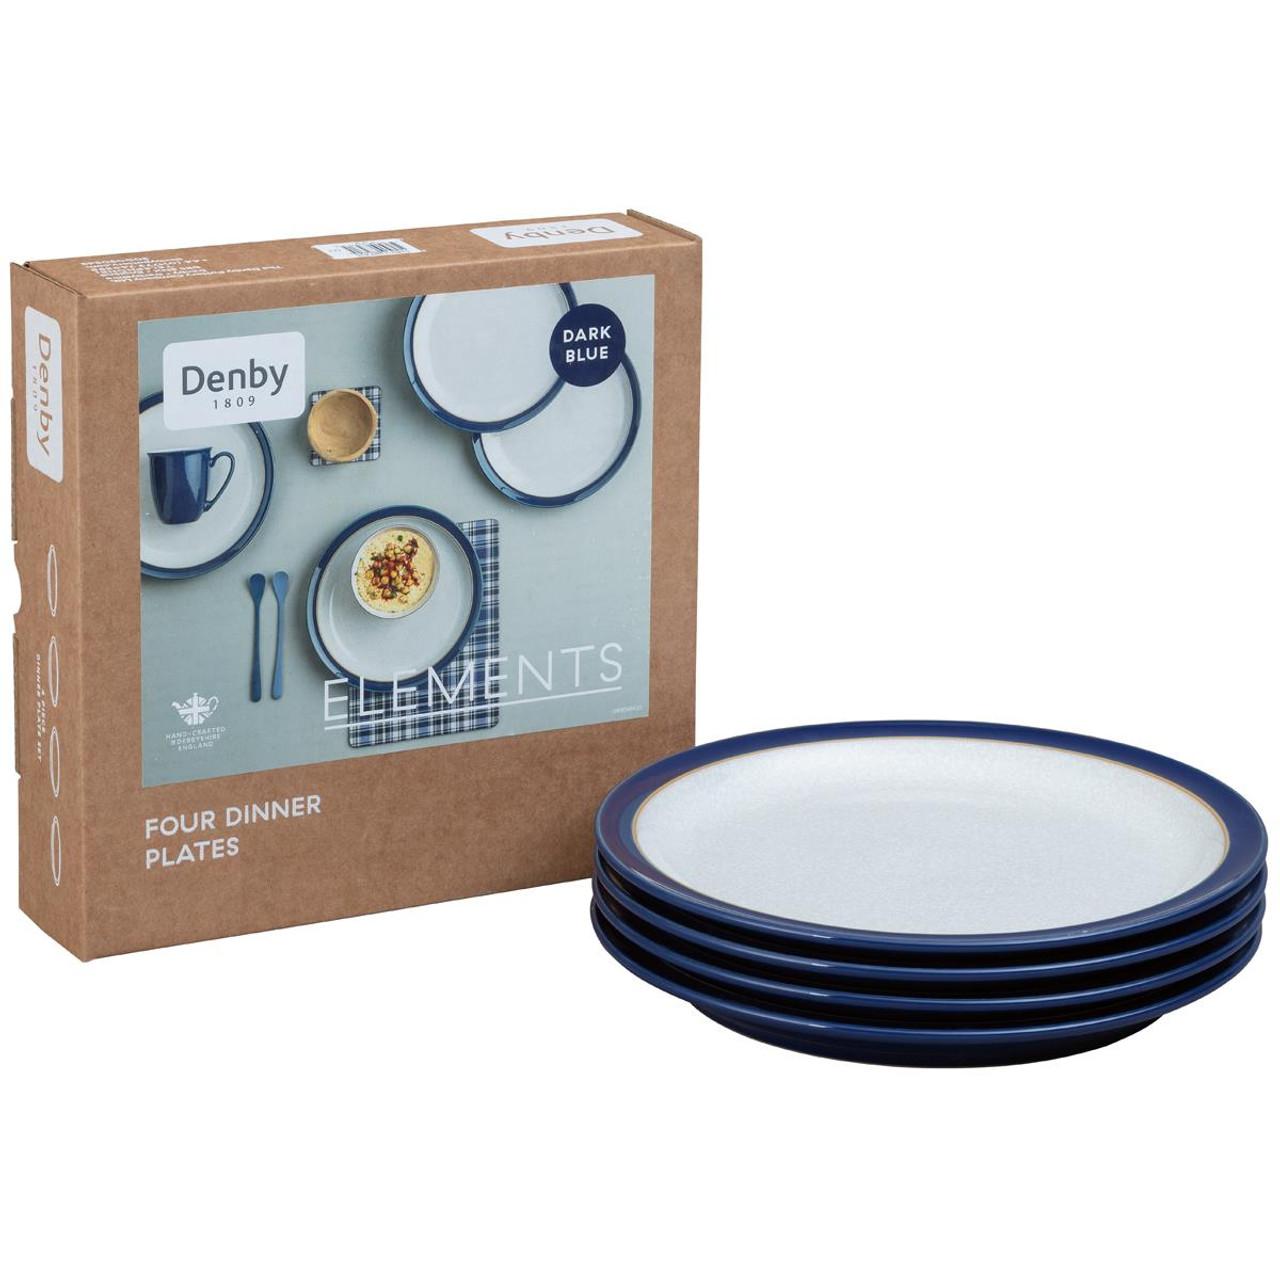 Denby Elements Dark Blue 4 Piece Dinner Plate Set